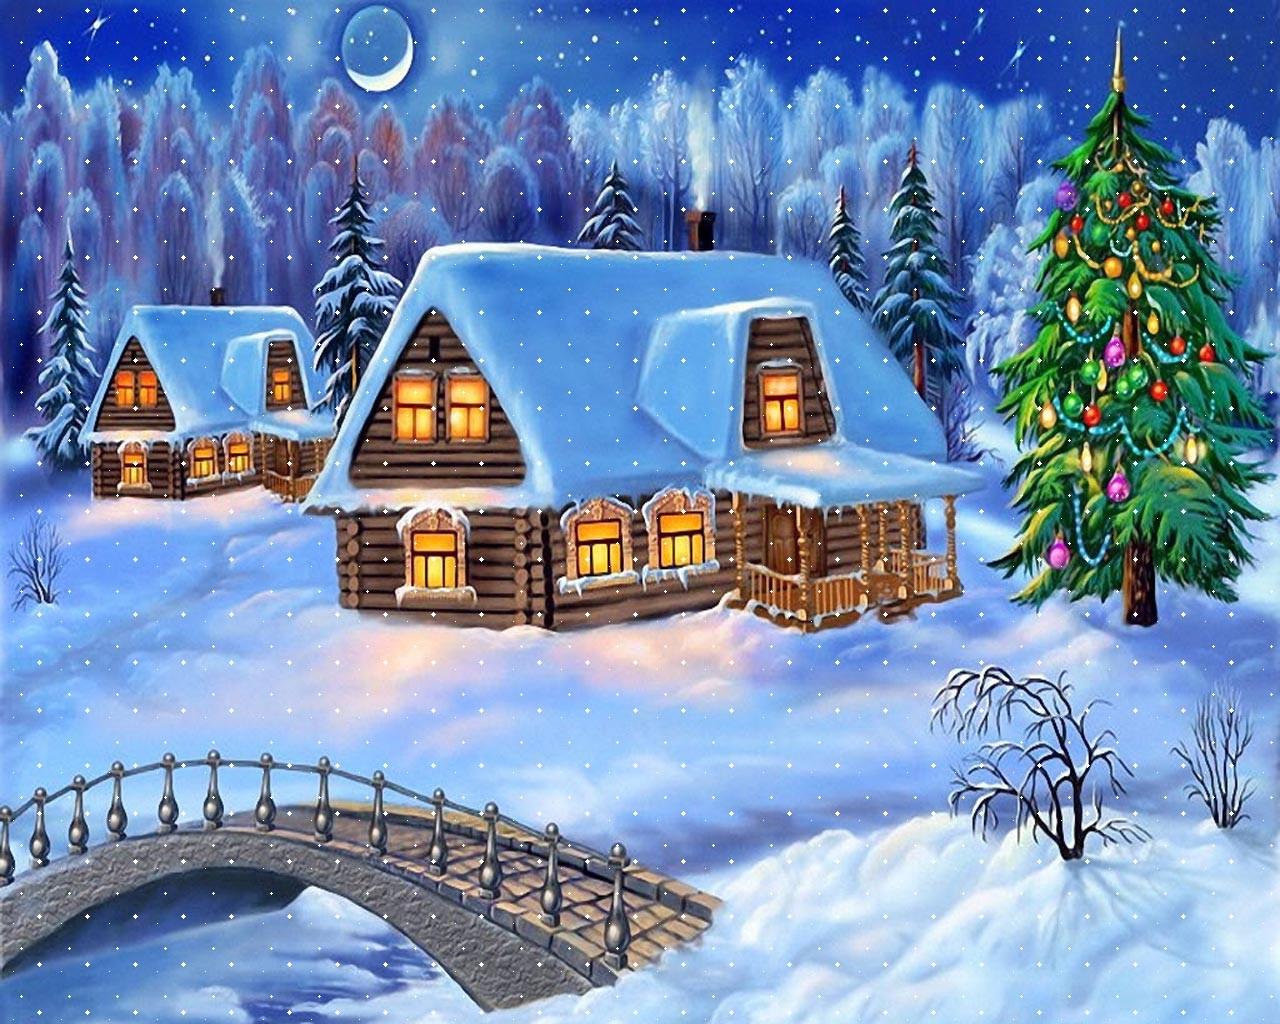 Snowy Christmas Night Decoration with Christmas Tree Wallpaper HD 1280x1024